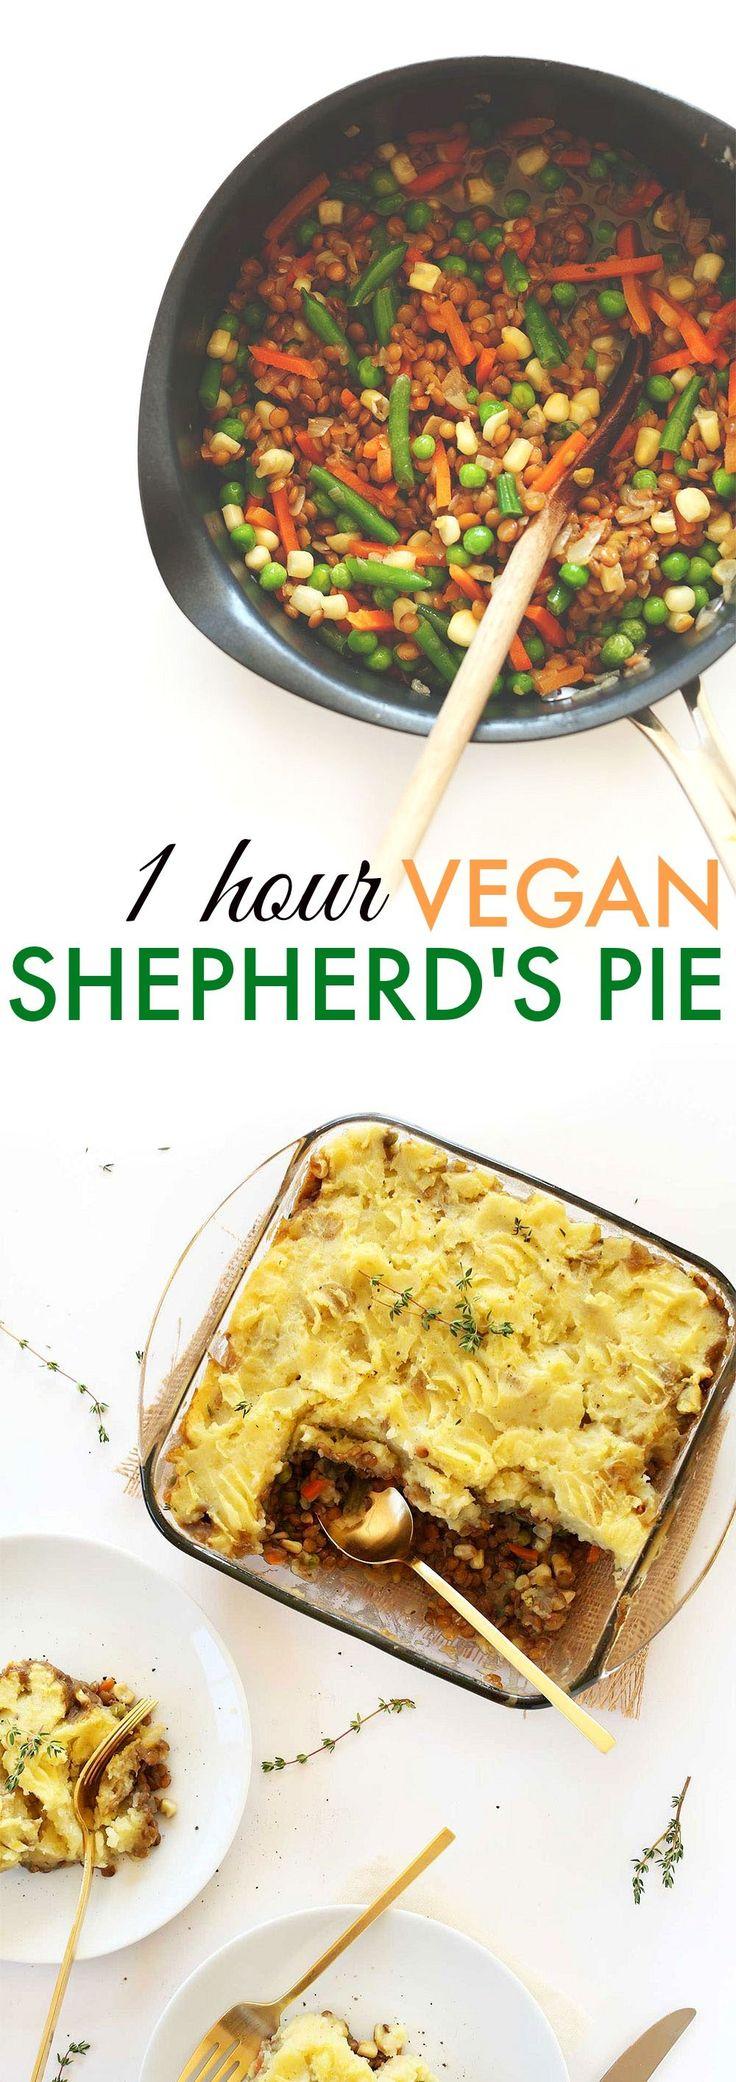 Vegan Shepherd's Pie - Easy & delicious version with veggies, lentils and the perfect potato mash